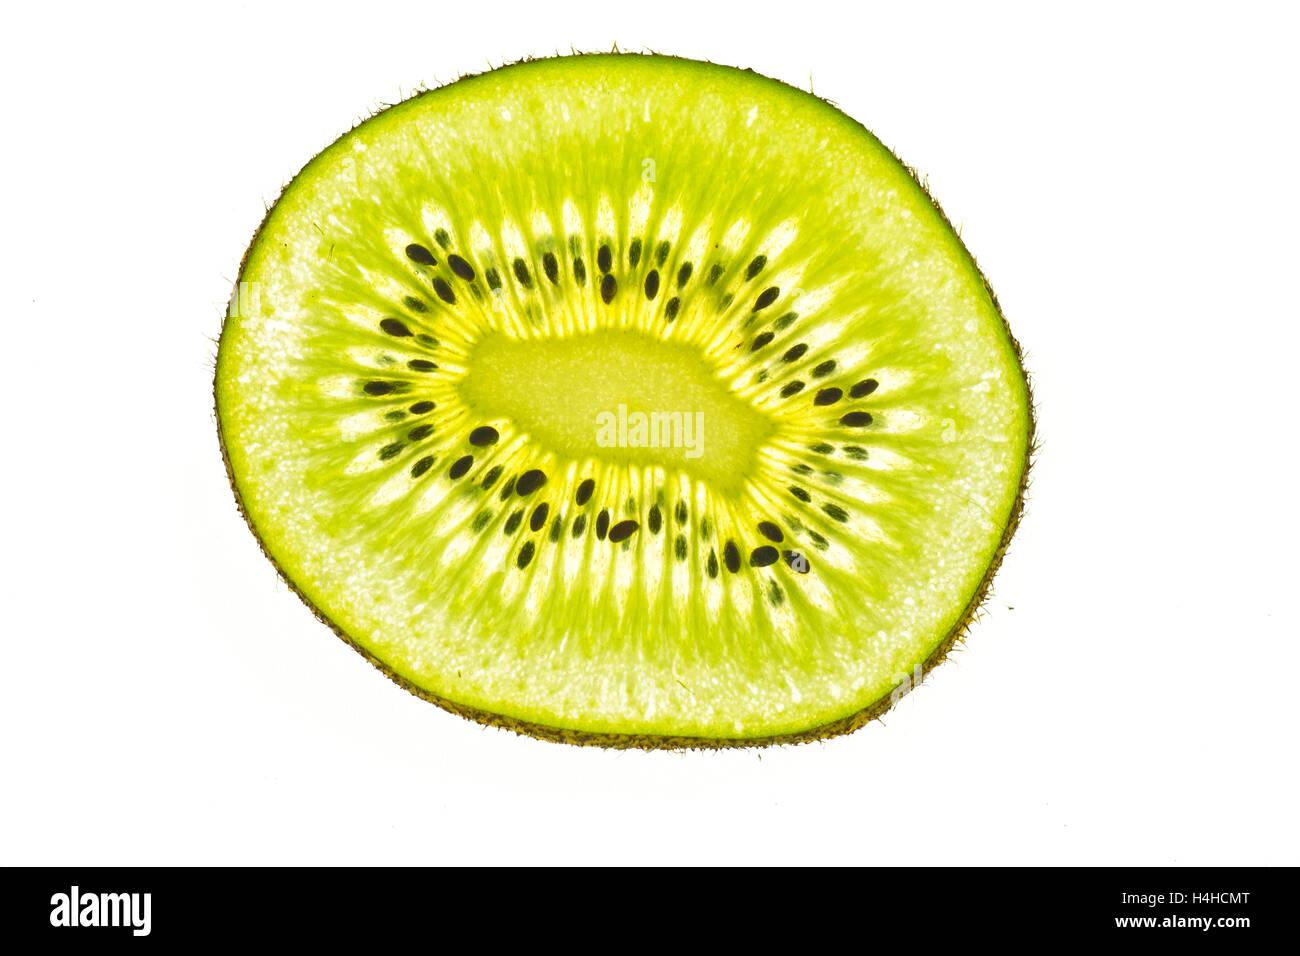 A bright kiwi slice - Stock Image